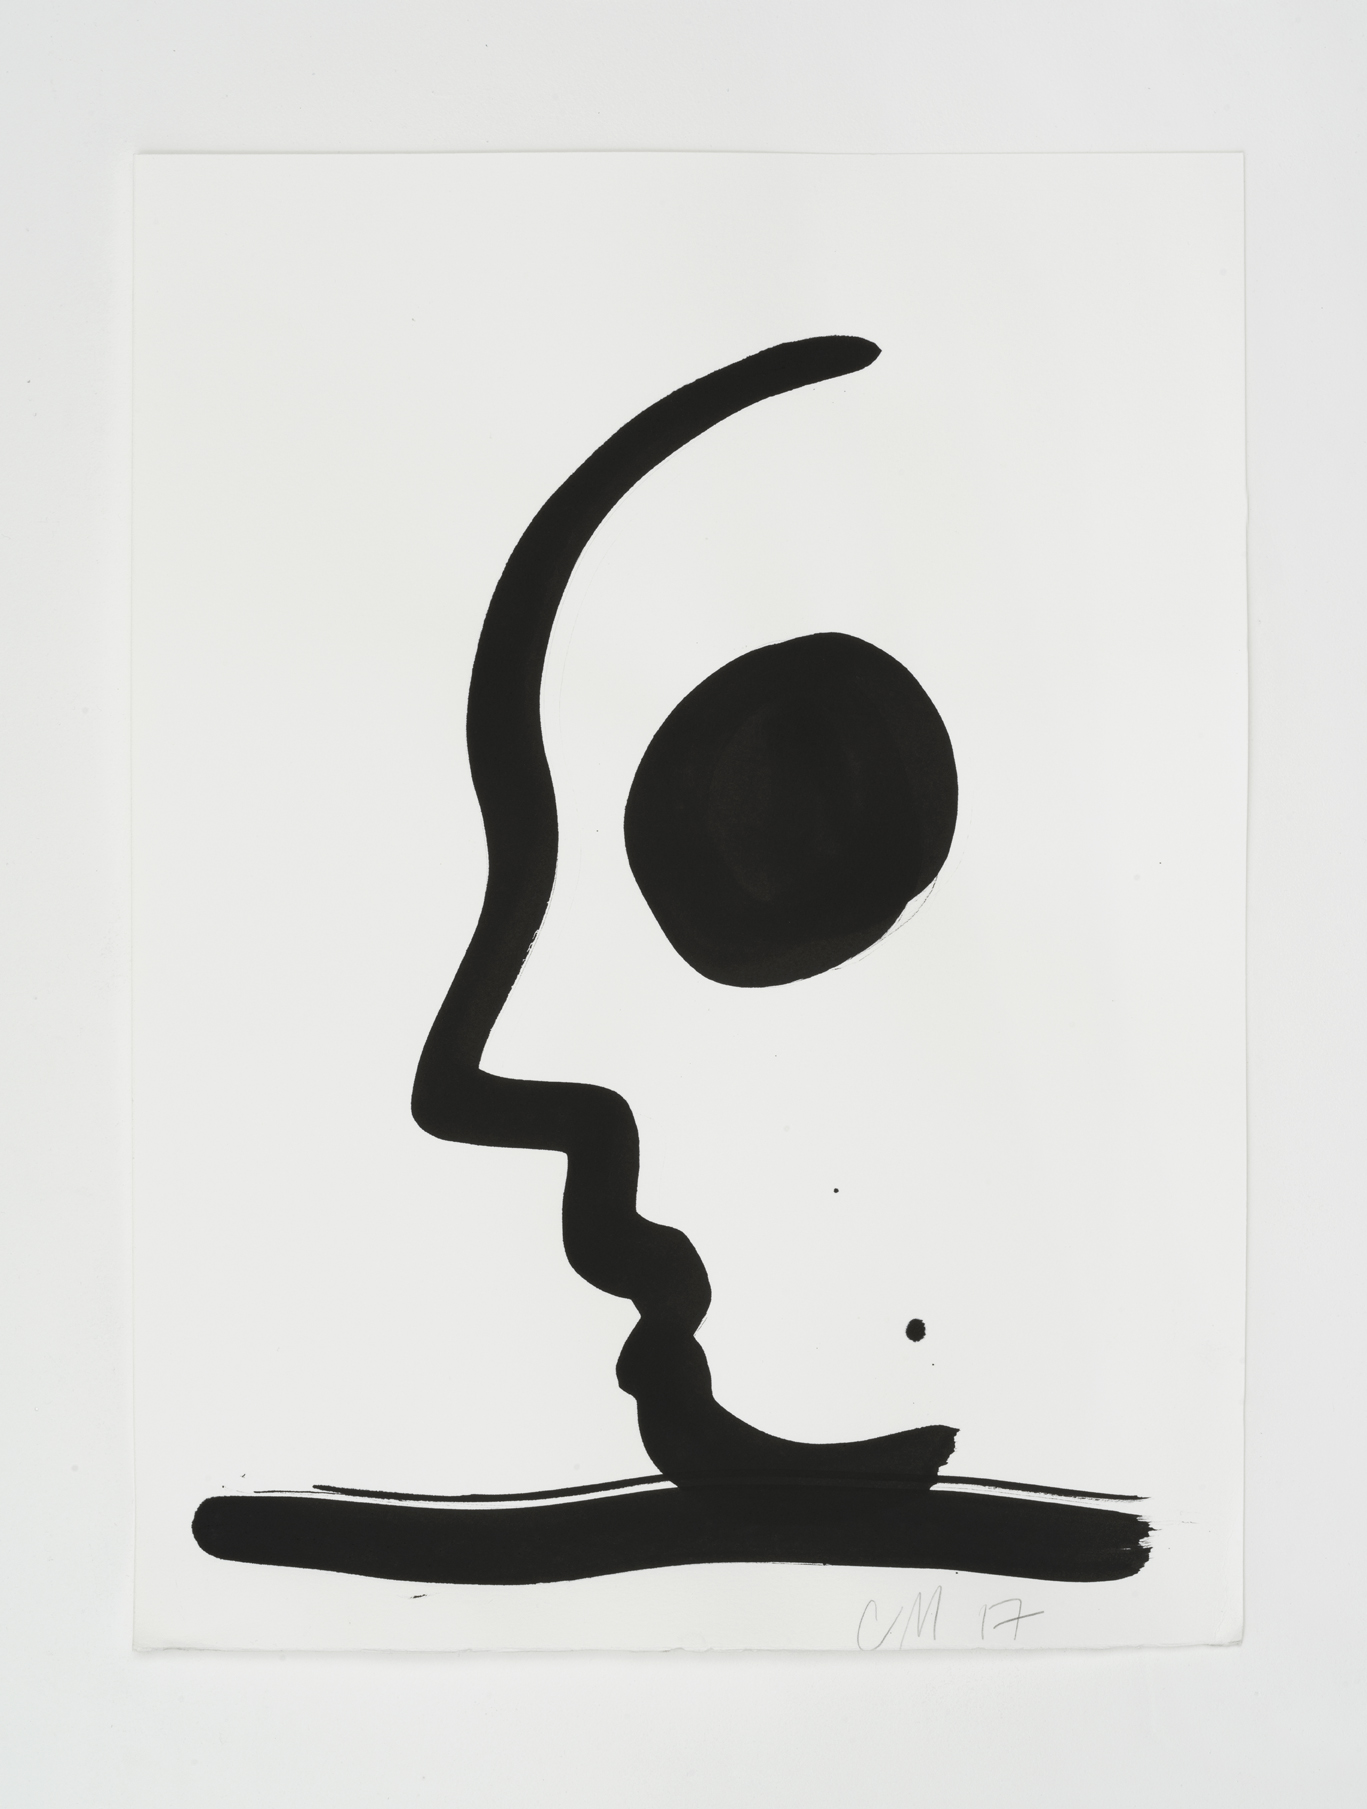 Untitled, Berlin Box, 15